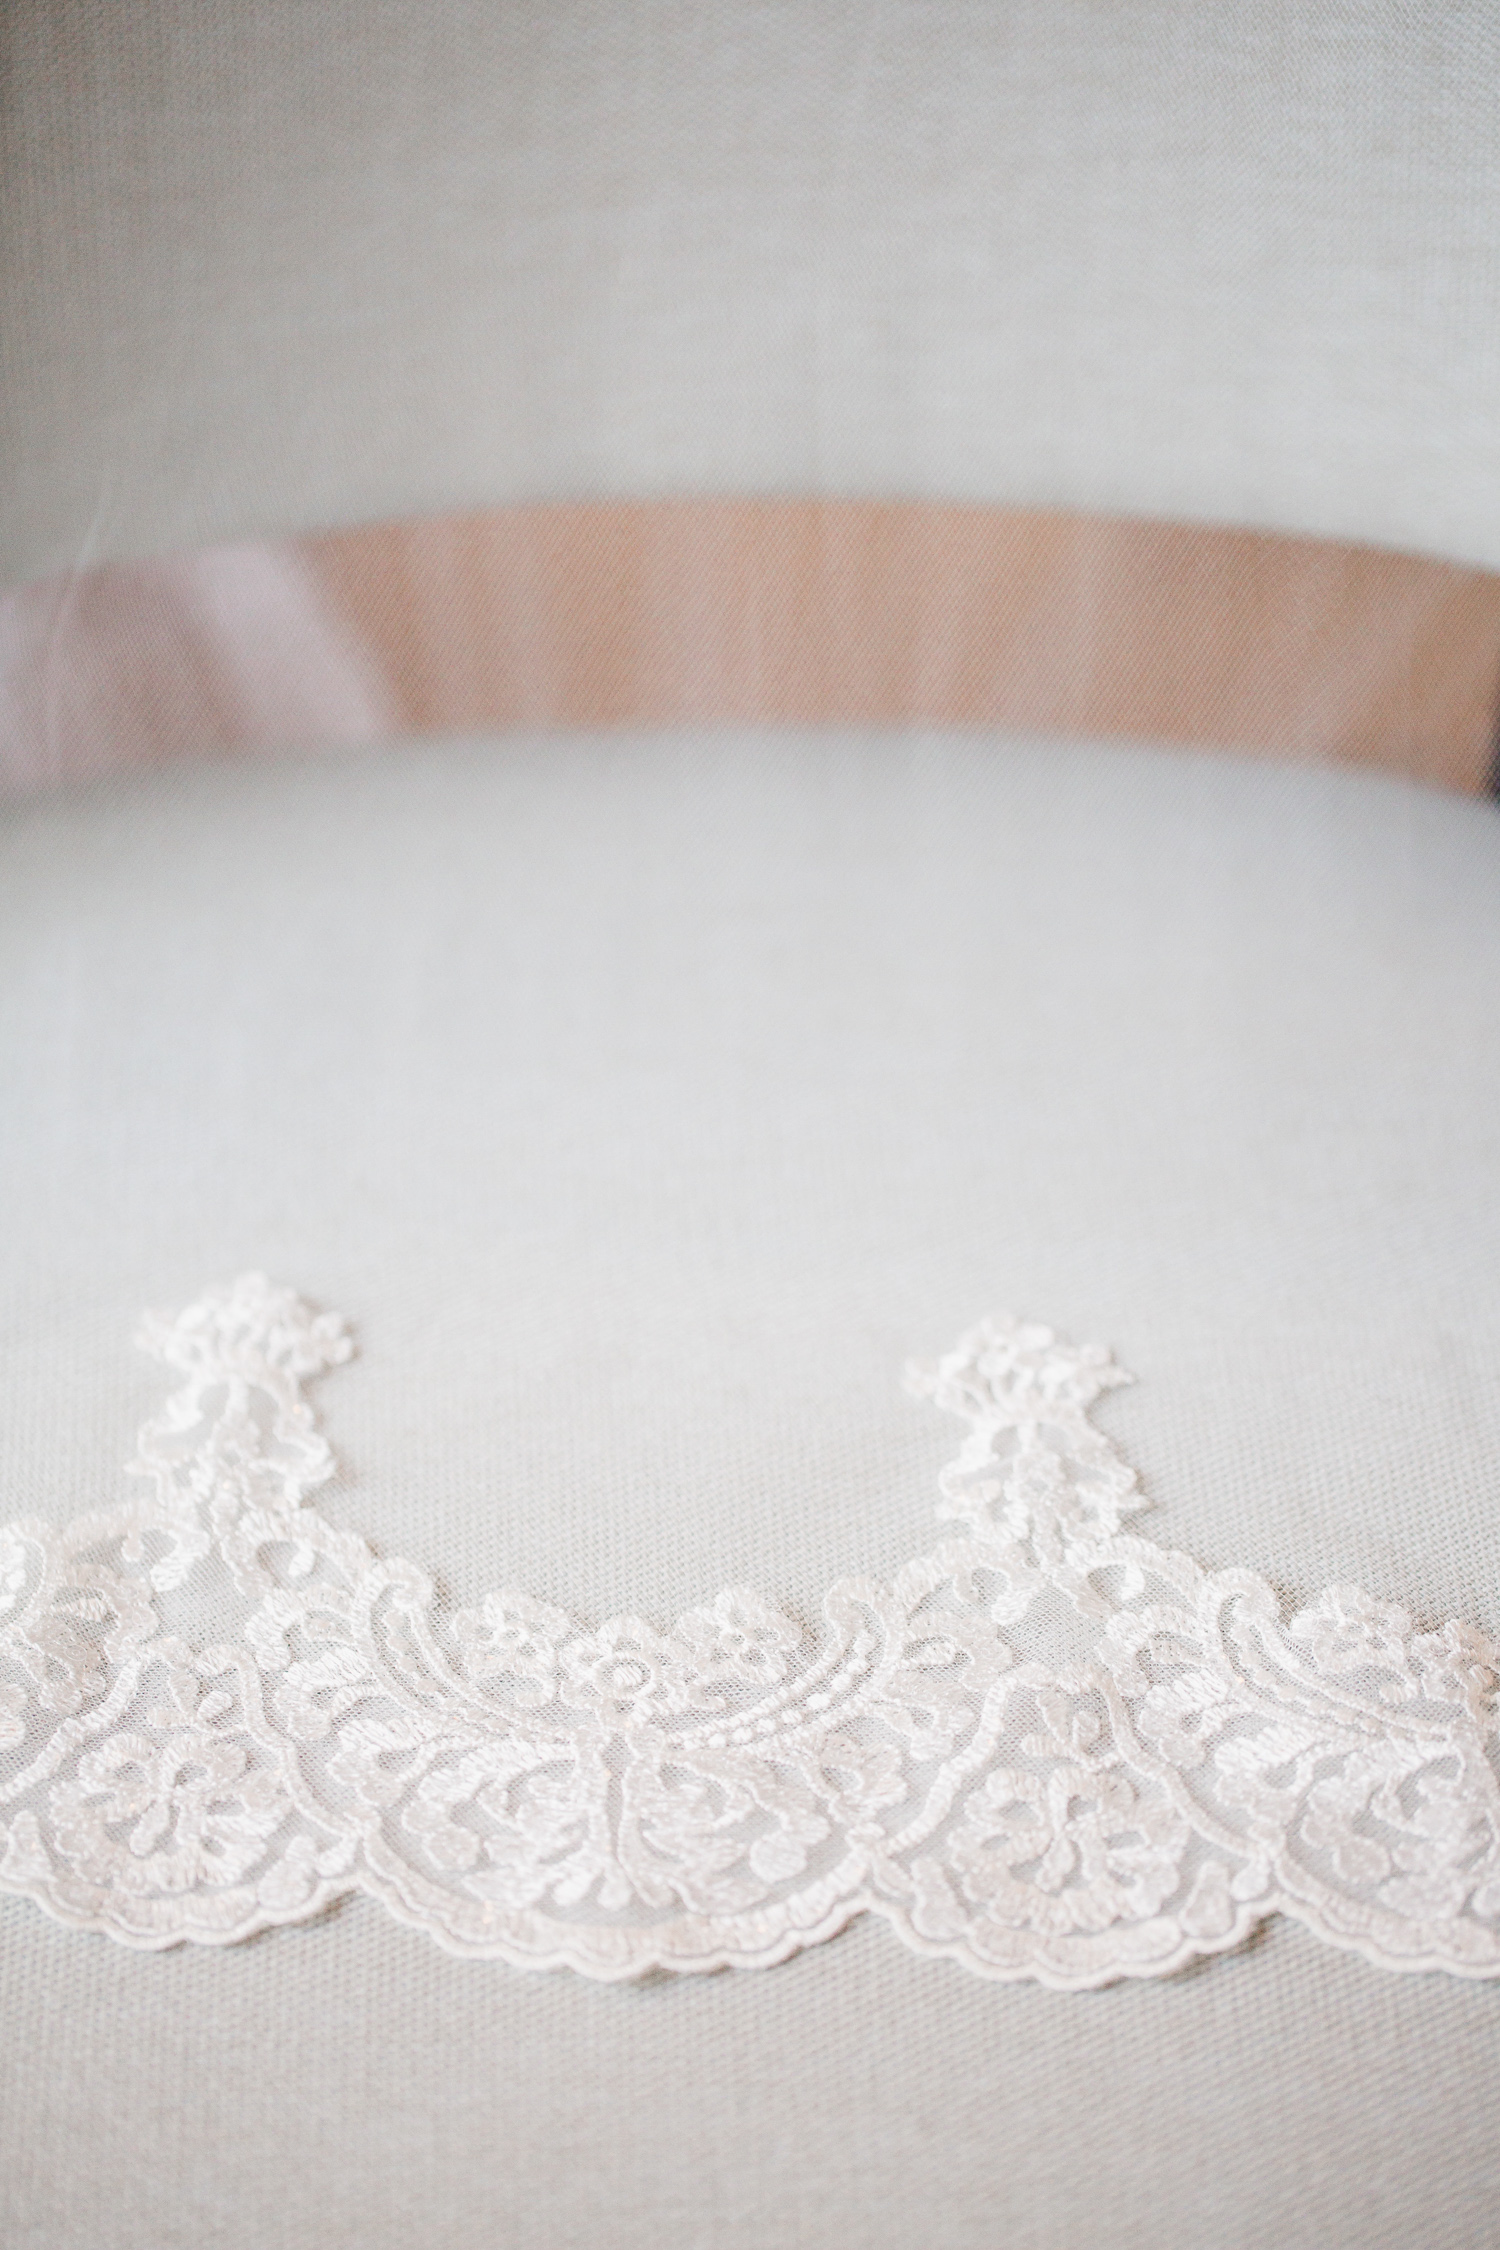 Downtown Knoxville Wedding Venue // Central Avenue Reception // Bridal Veil